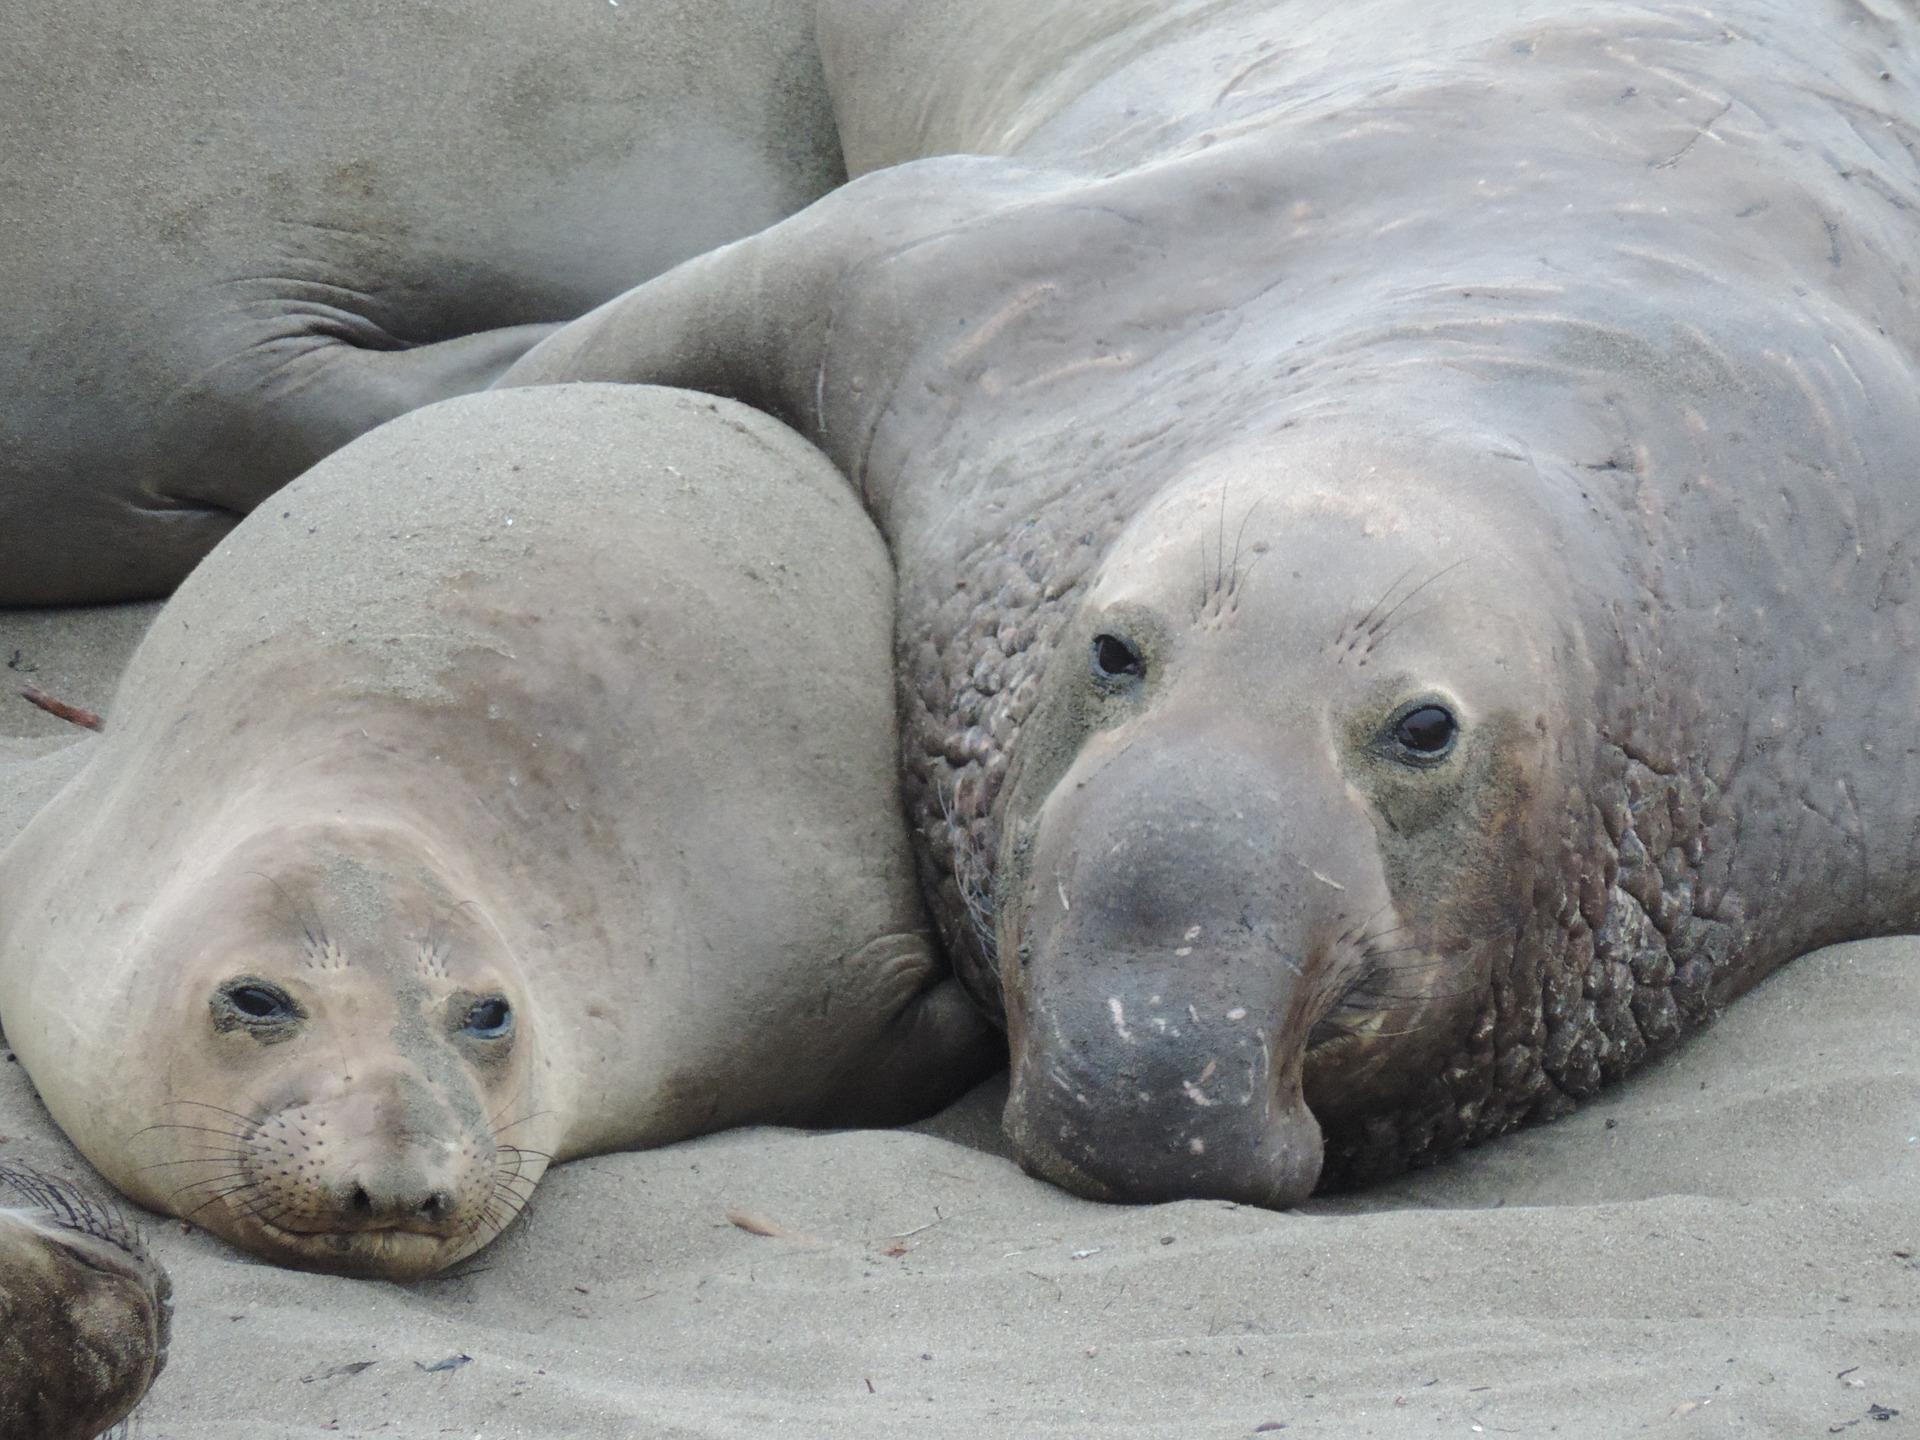 Two seals hugging